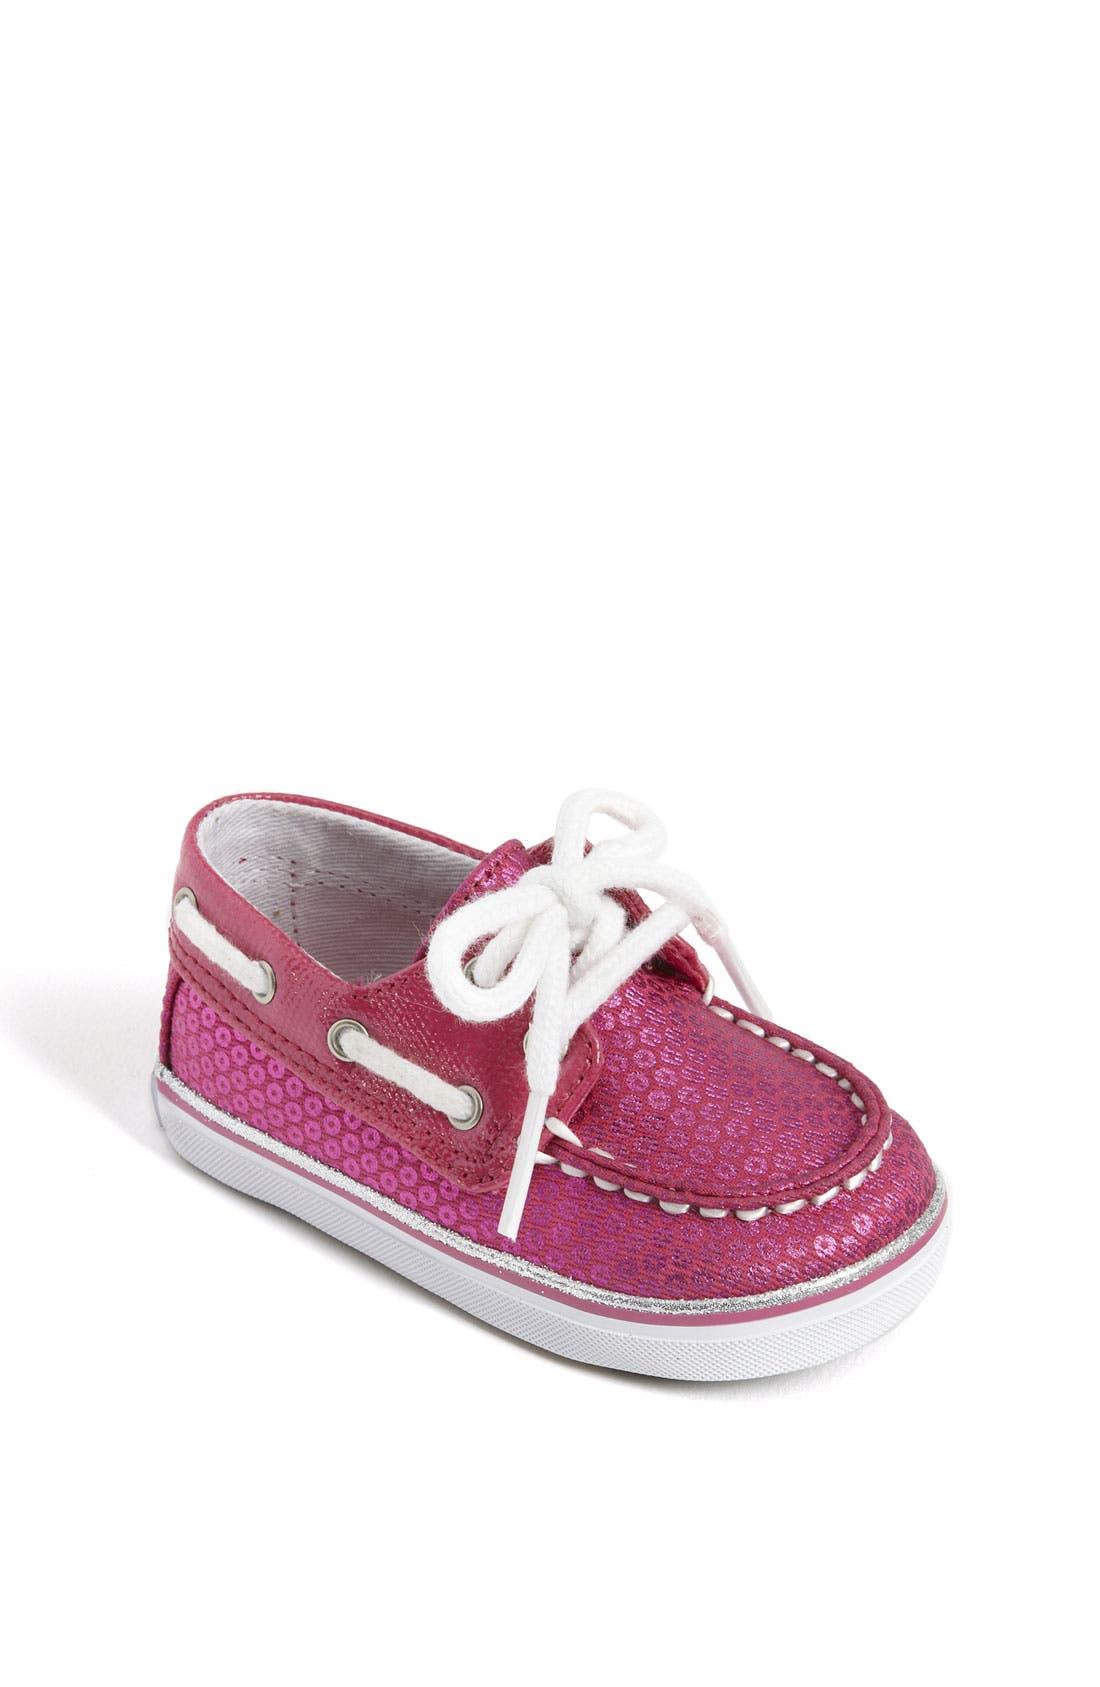 Main Image - Sperry Top-Sider® 'Bahama' Crib Shoe (Baby)